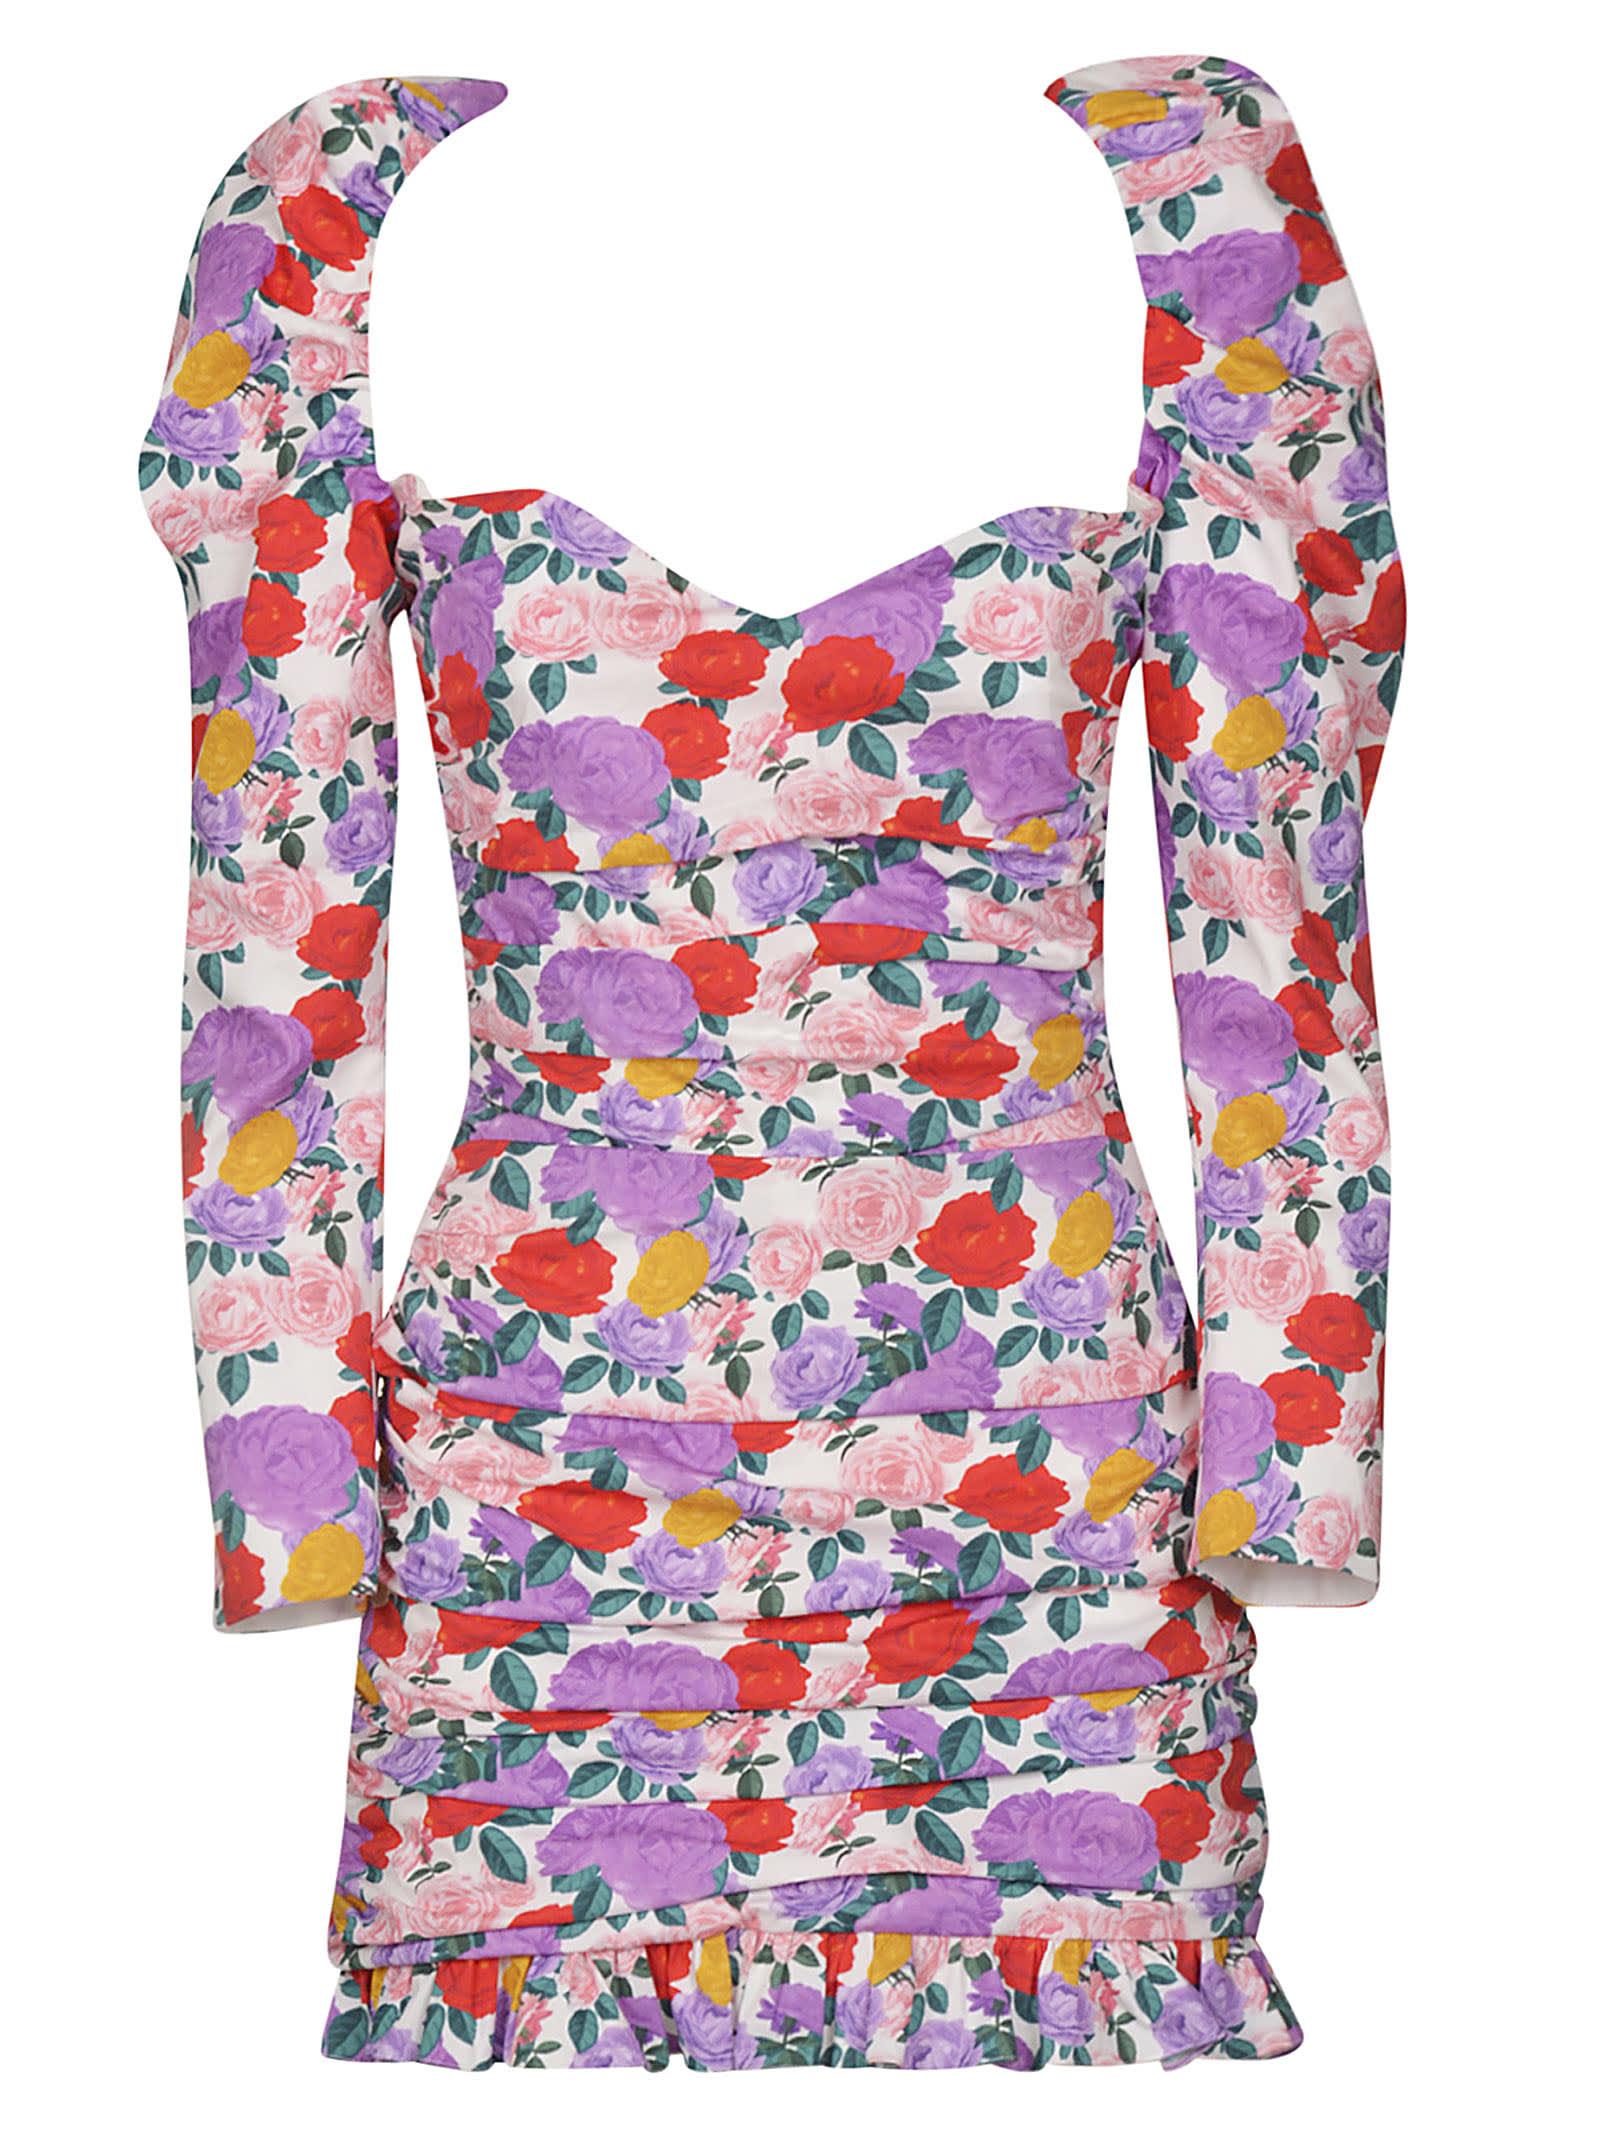 Buy Giuseppe di Morabito Floral Print Ruffled Dress online, shop Giuseppe di Morabito with free shipping